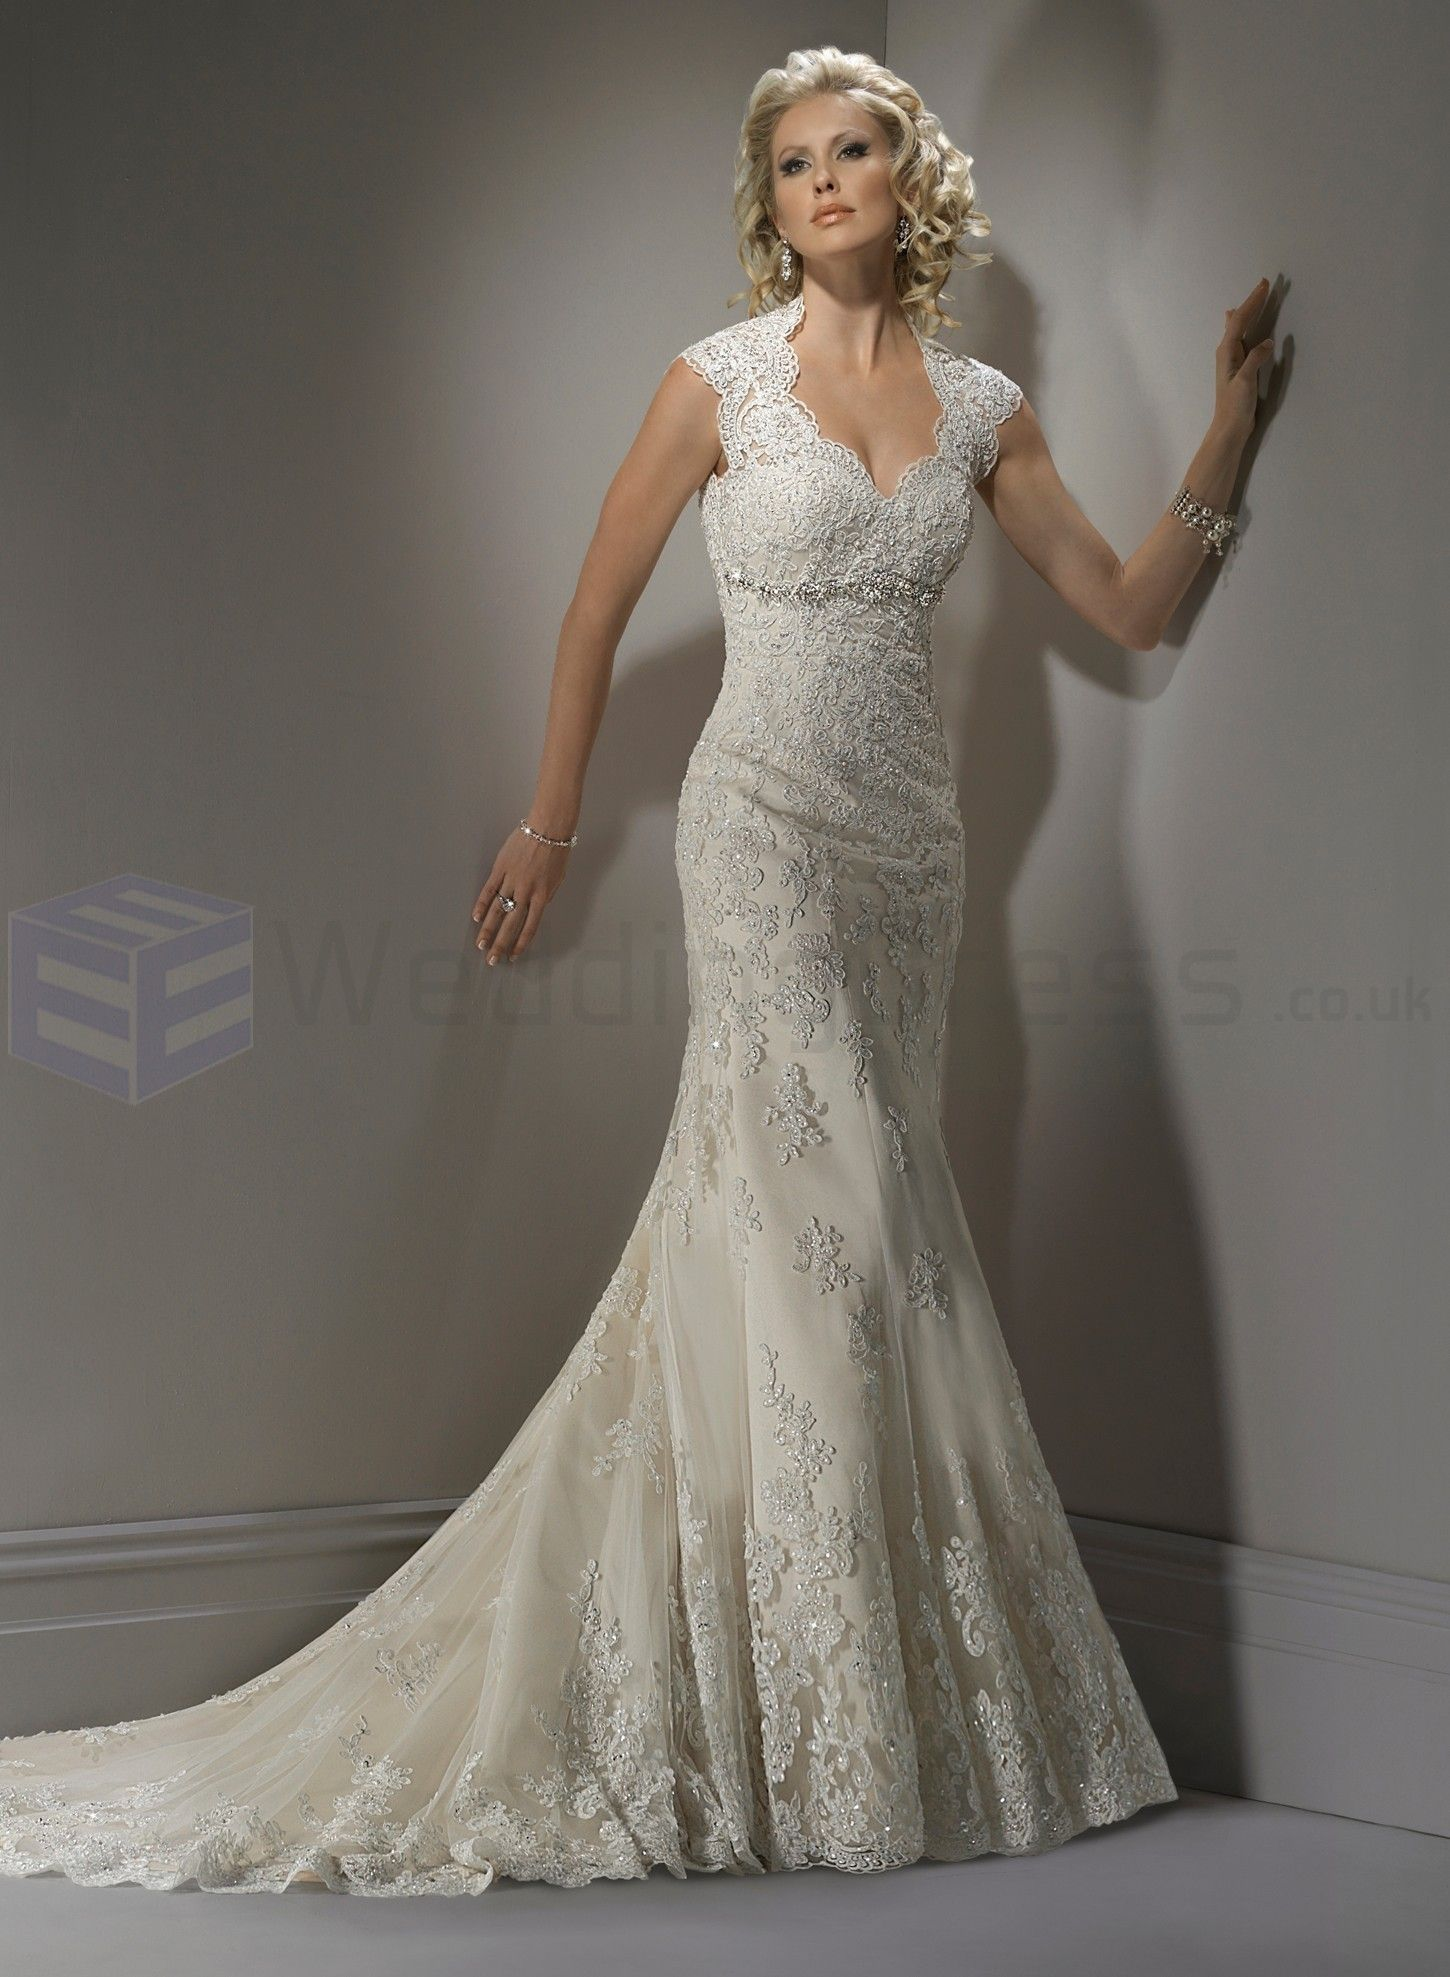 Lace Sweetheart Neckline A Line Wedding Dress